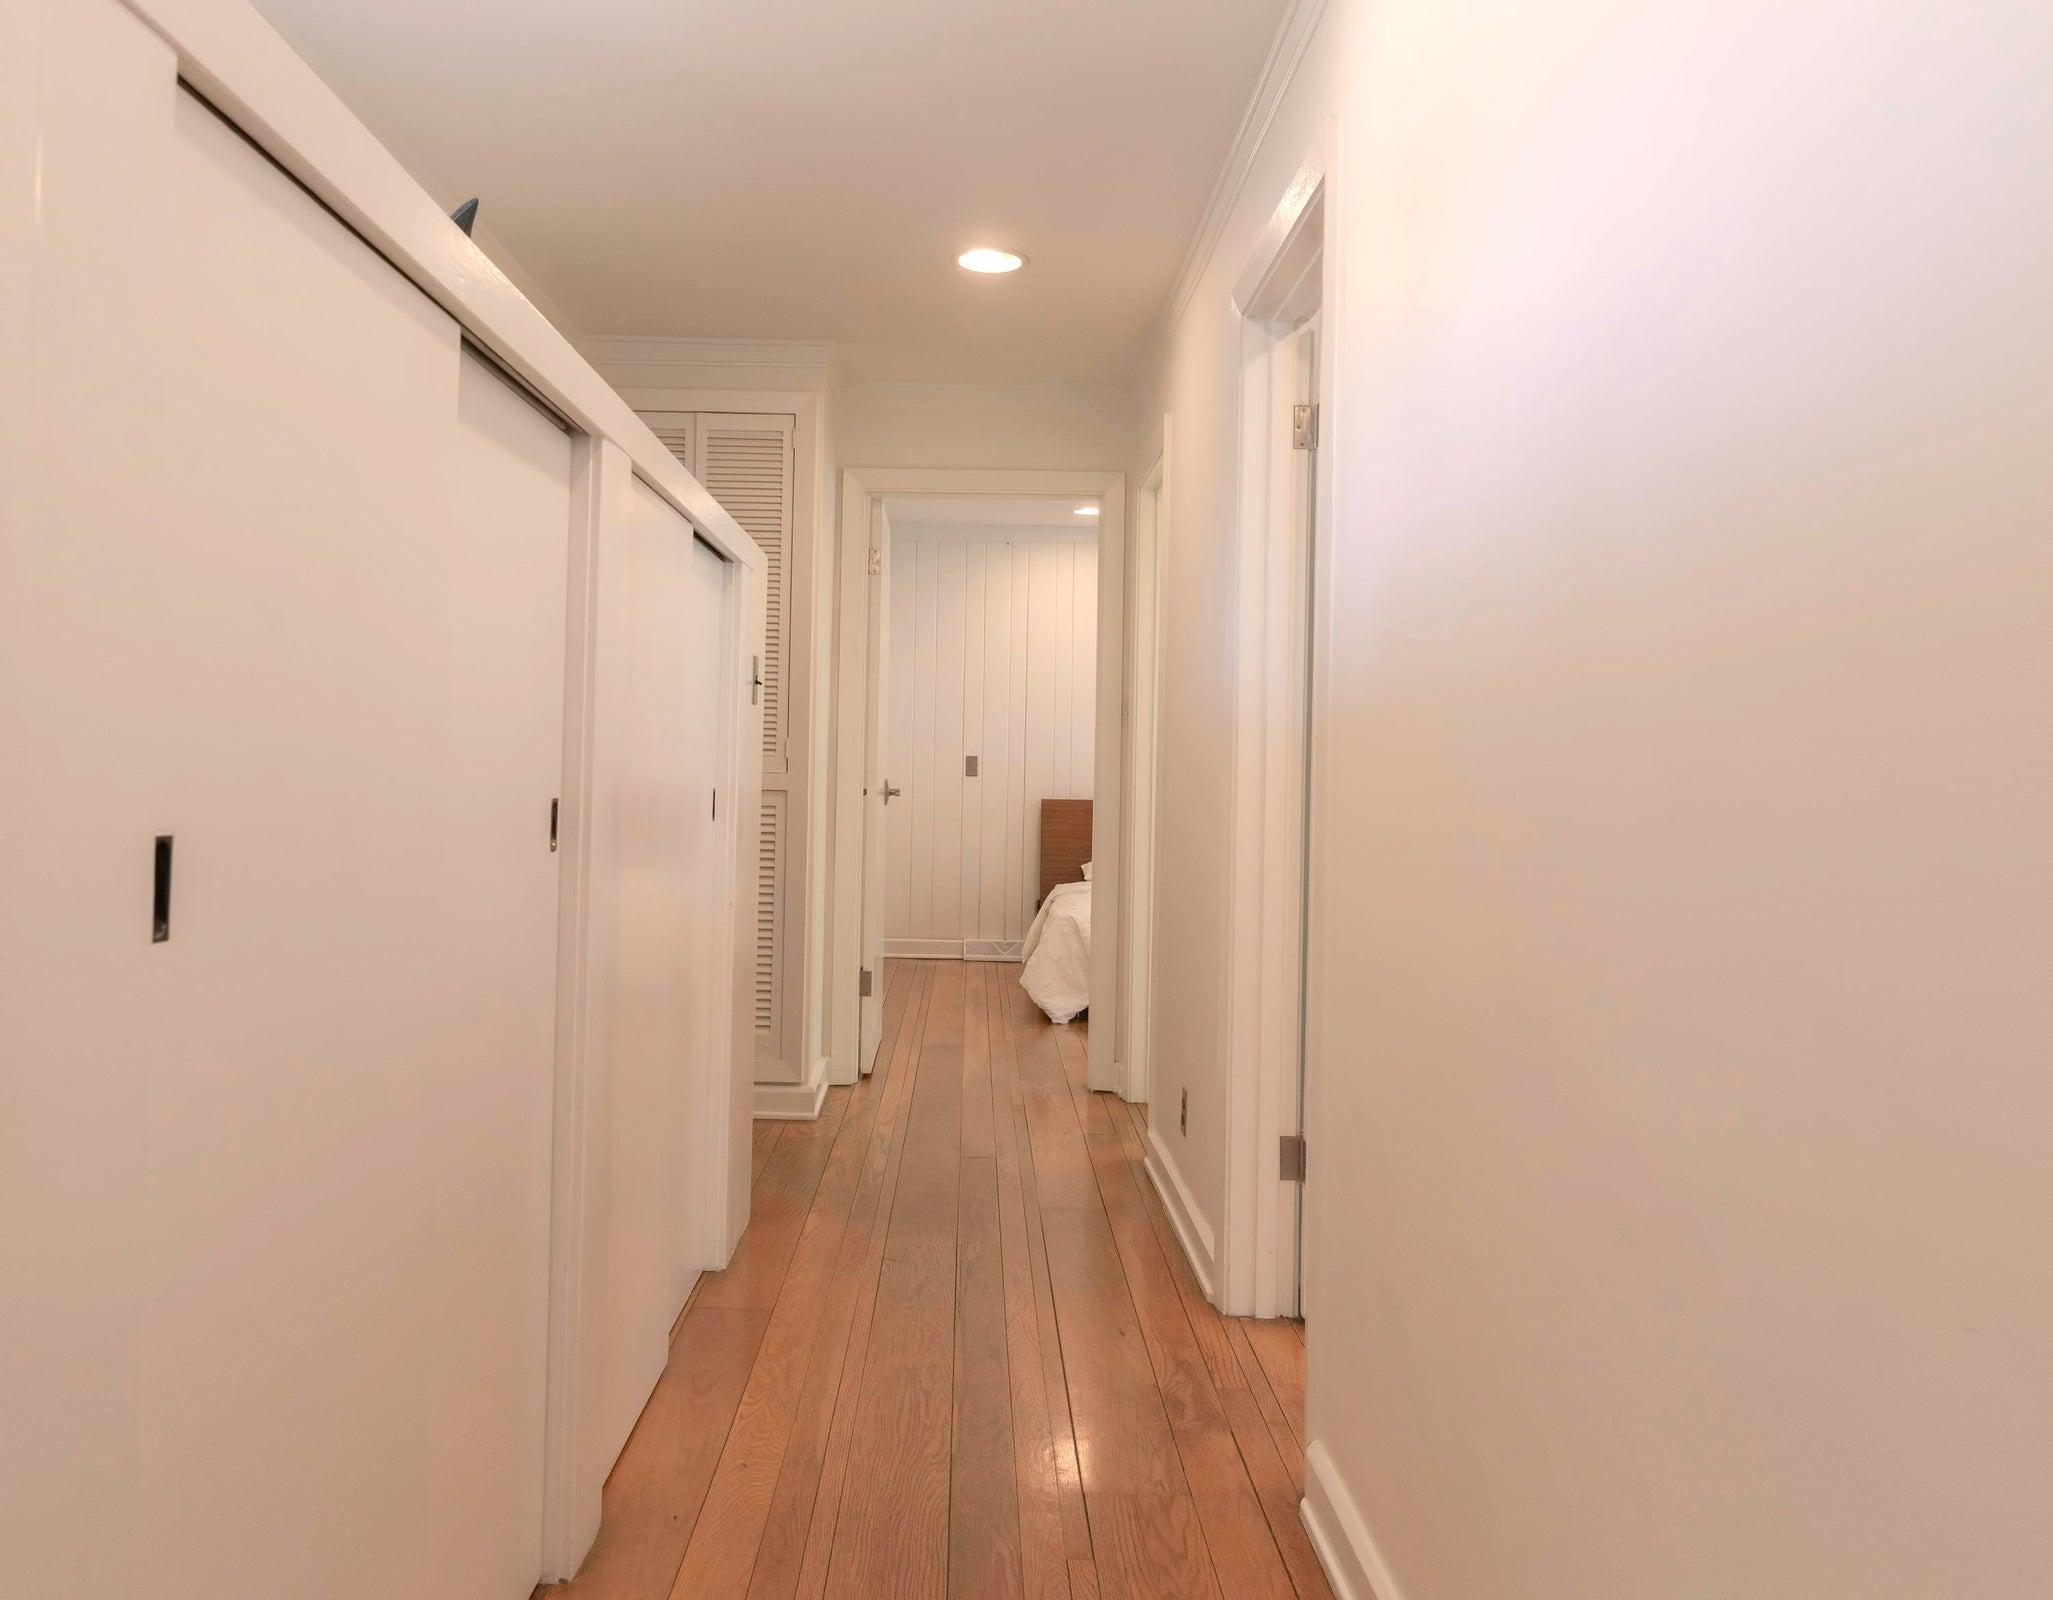 DSC_1990 - Hallway with Original Built-I